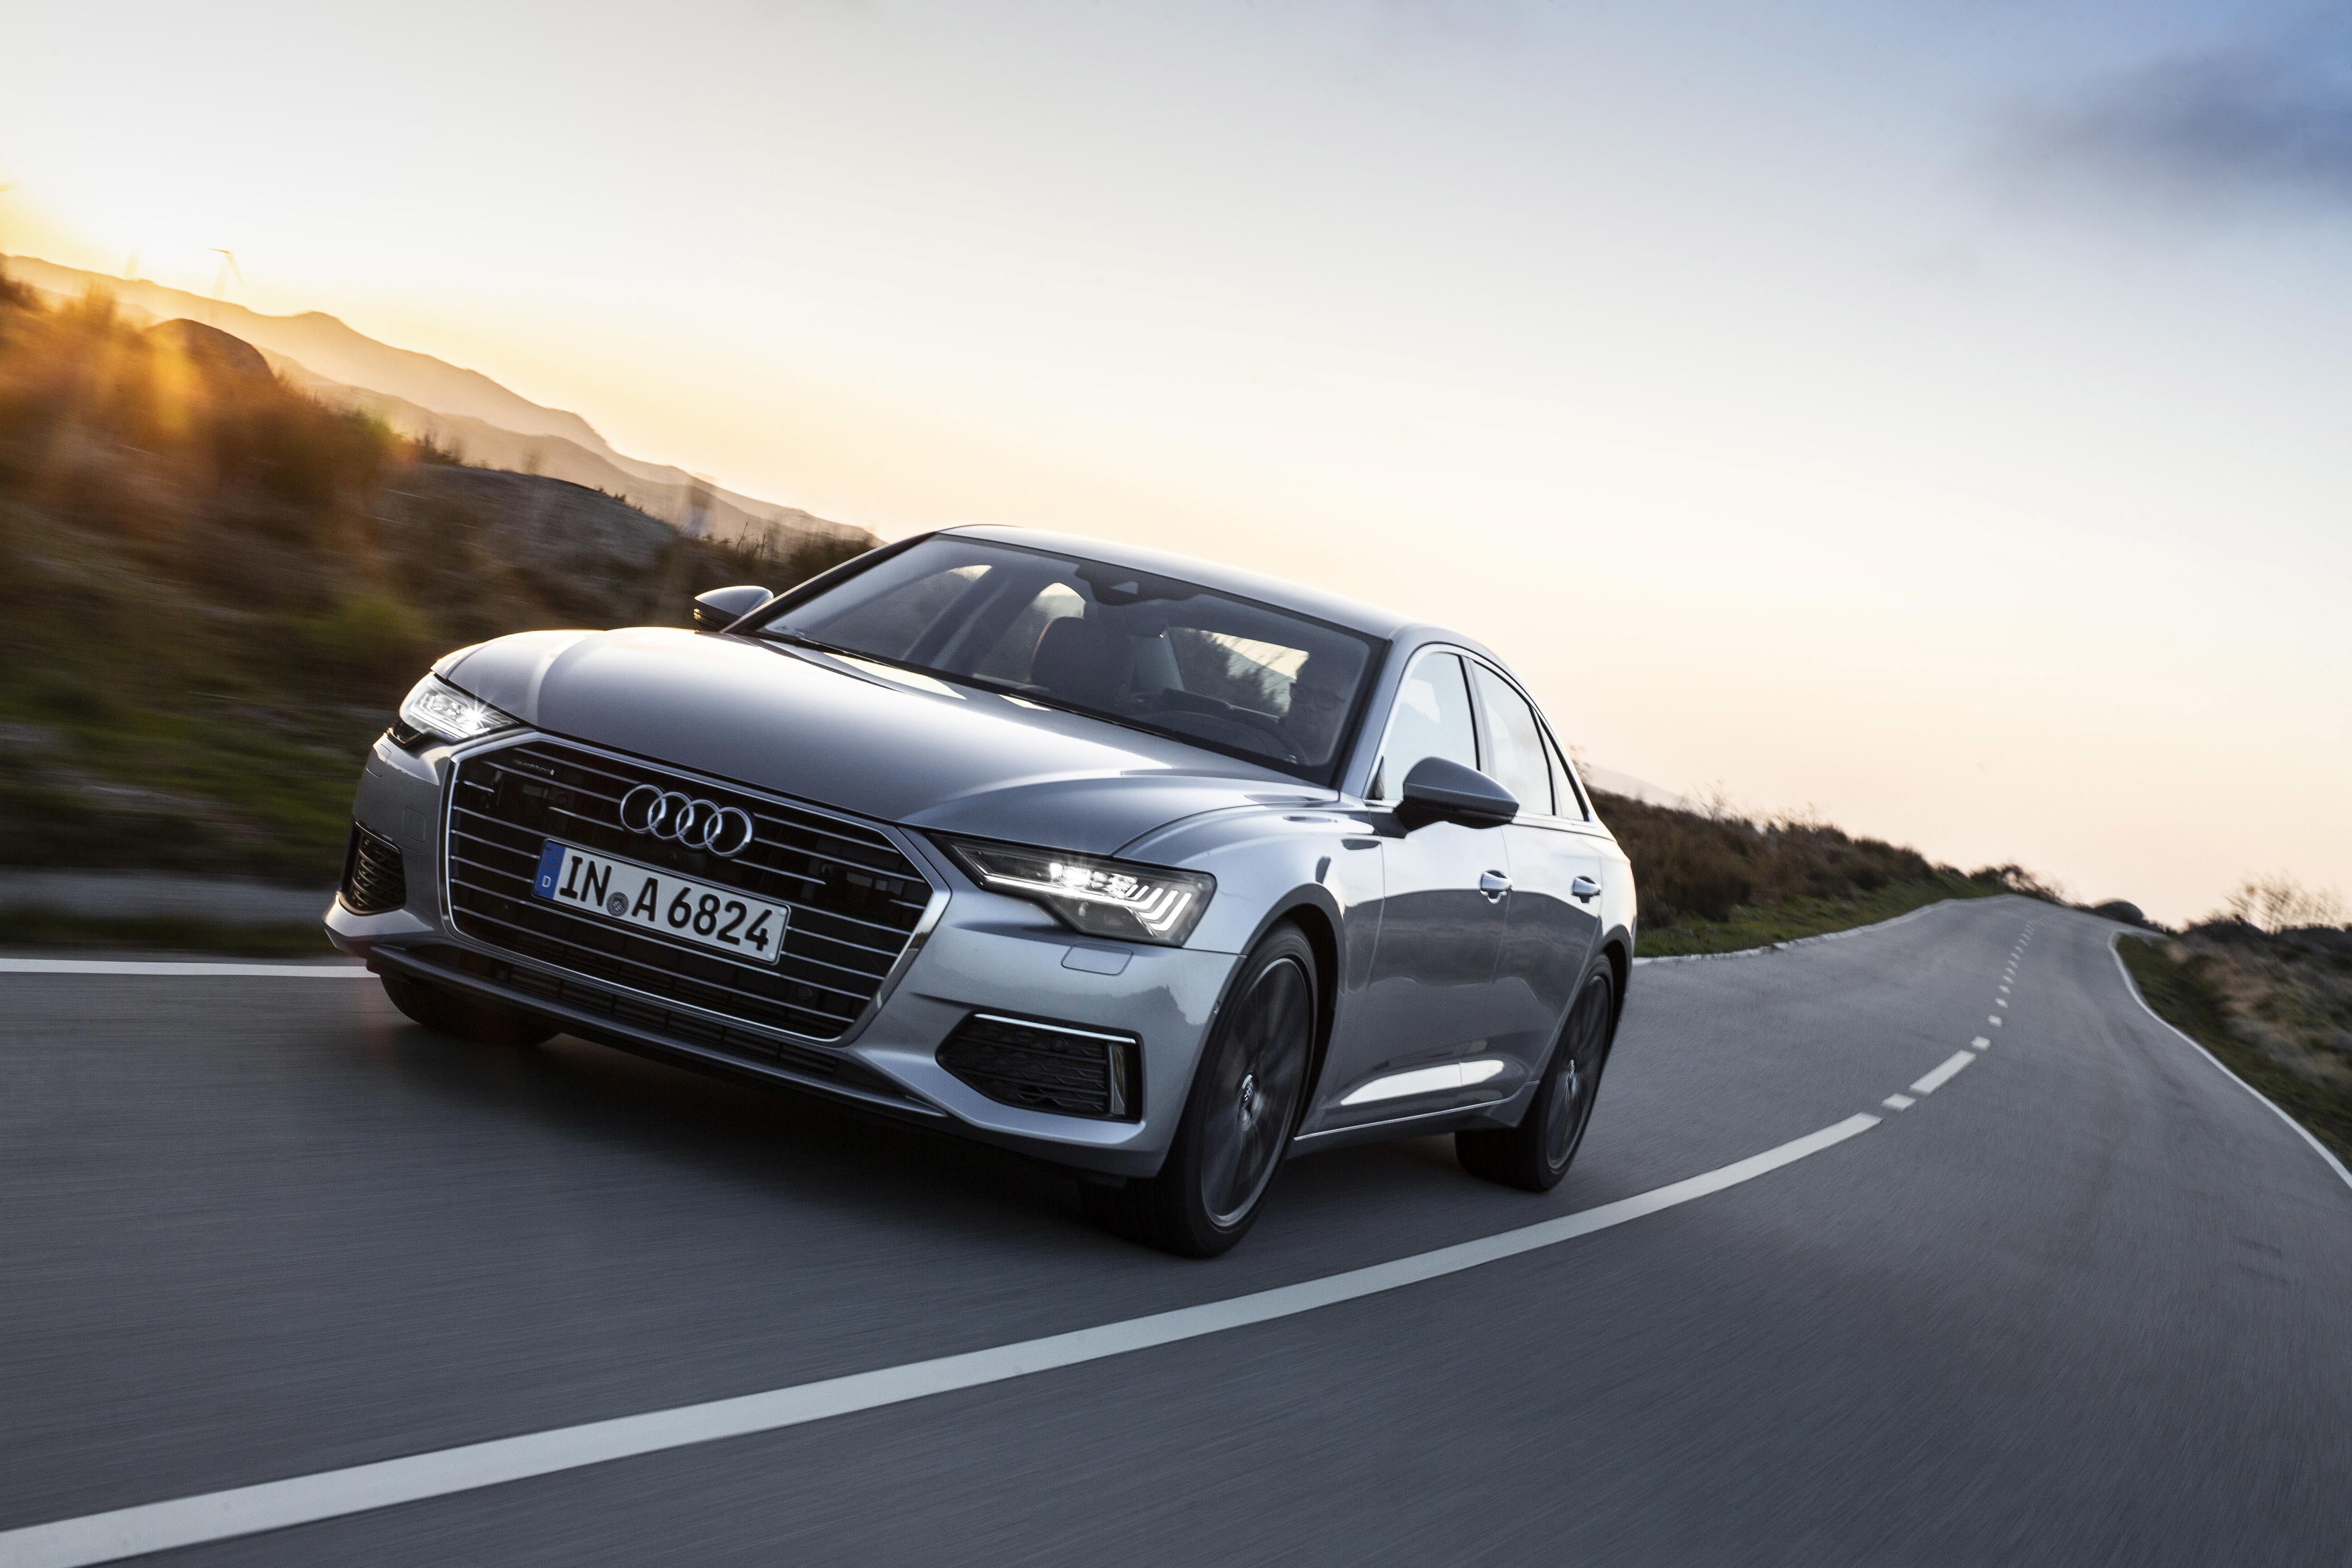 Kekurangan Audi A6 V6 Spesifikasi